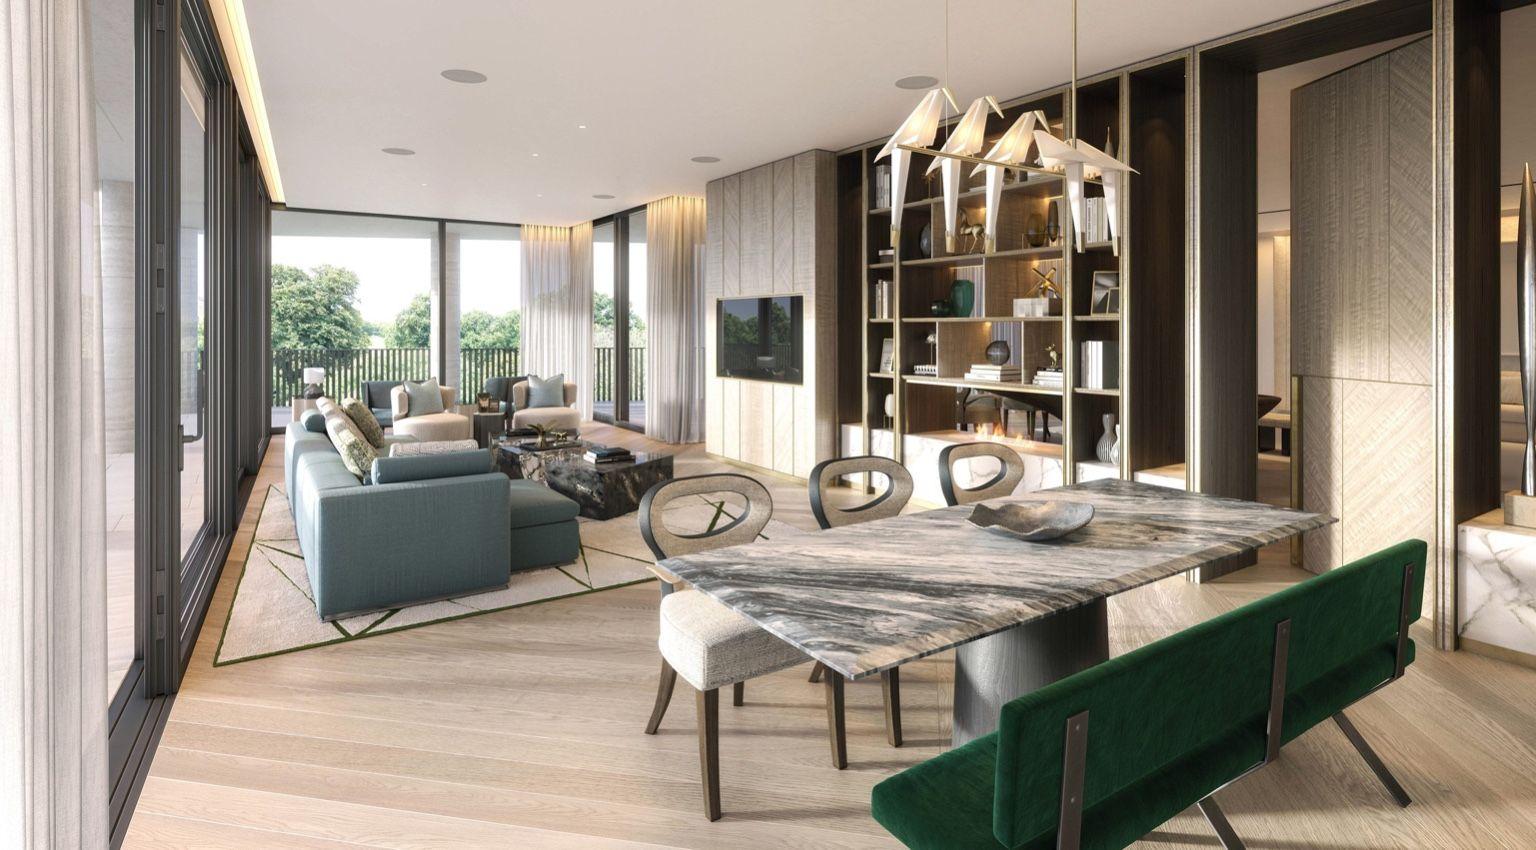 Pin By Lynn Jafar On Dream Home 2020 Interior Interior Design